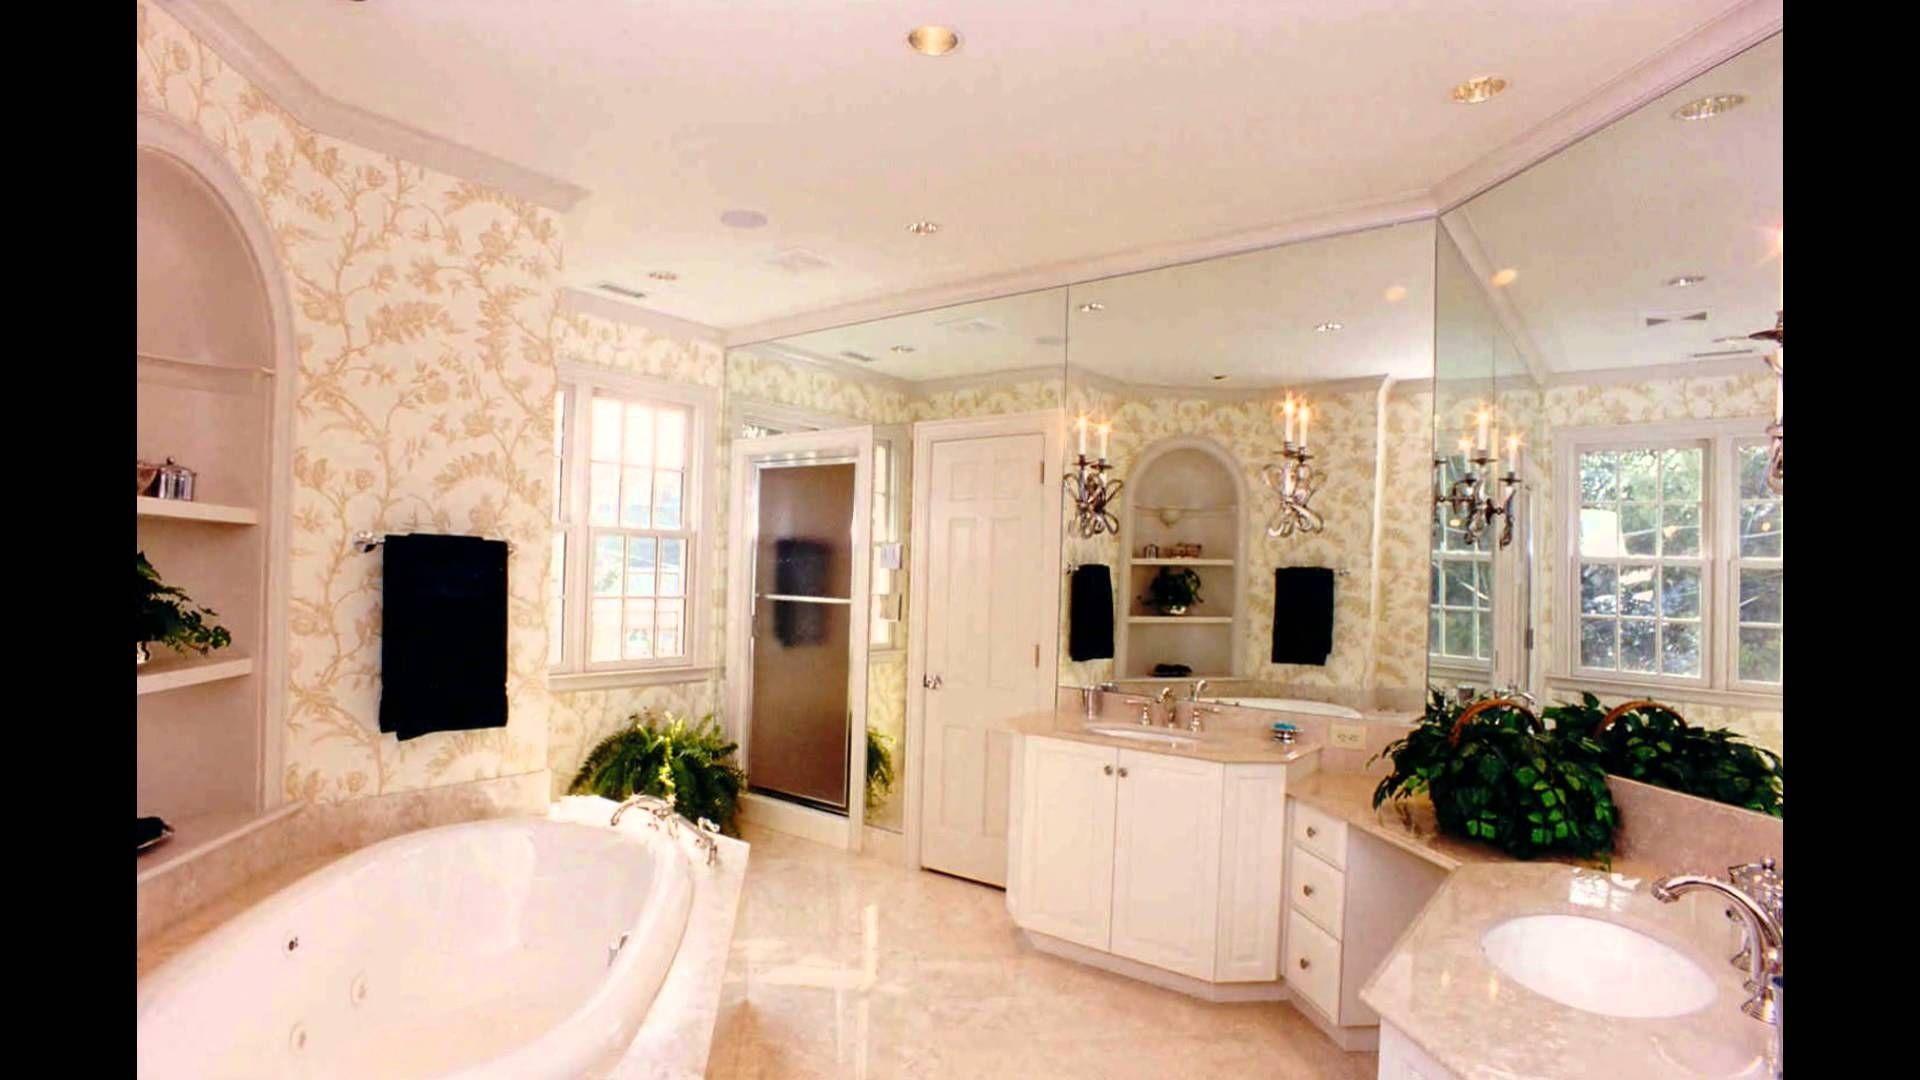 Master bathroom hardwood floors, large tub, his and her